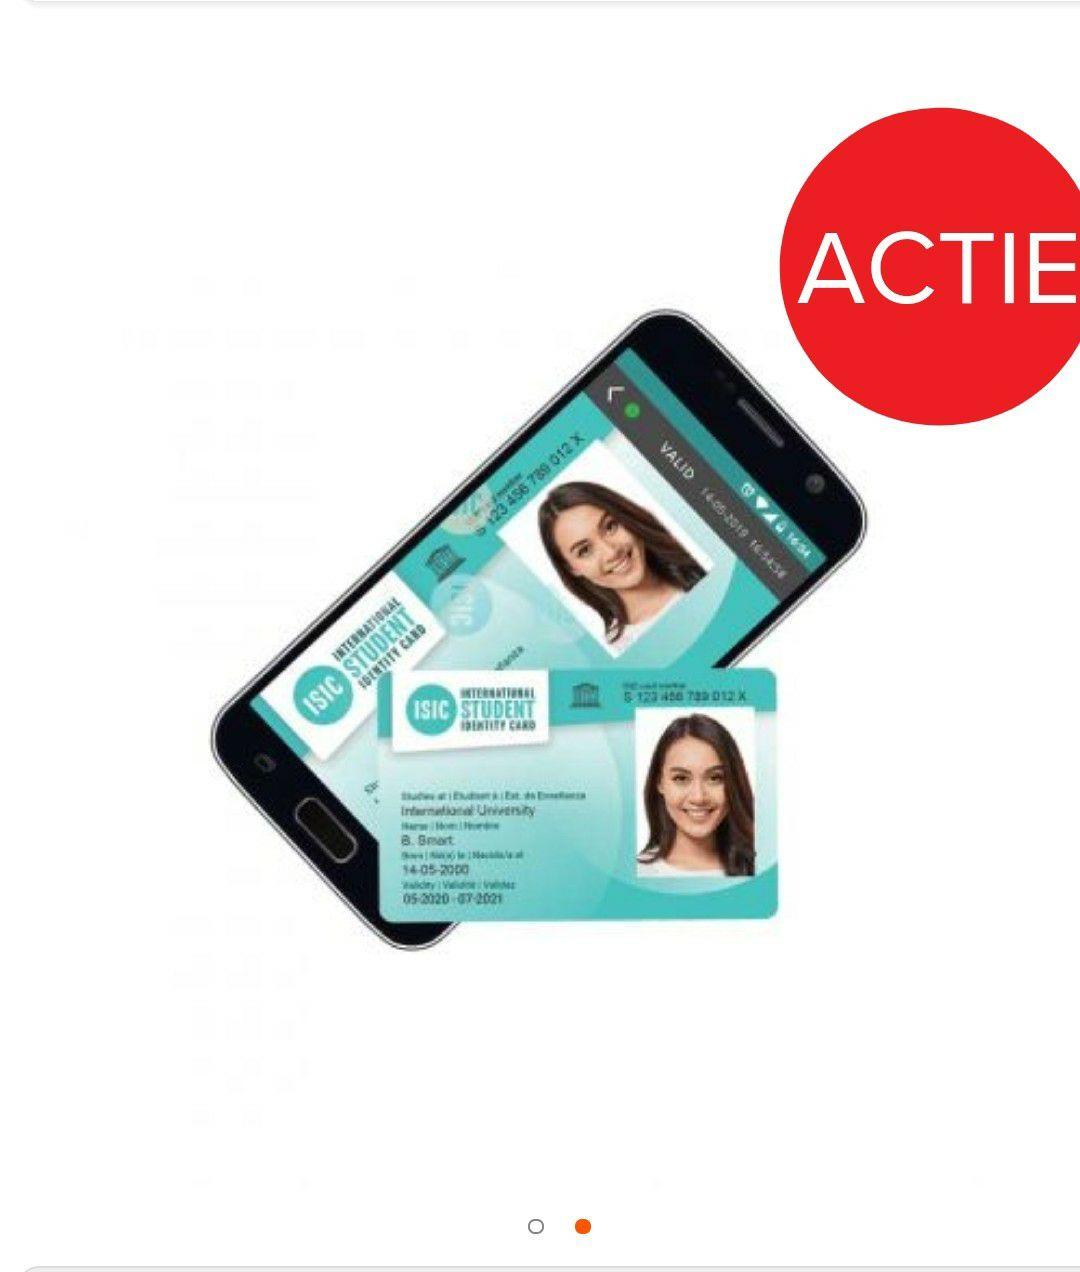 Gratis International Student Identity Card (ISIC) bij SurfSpot